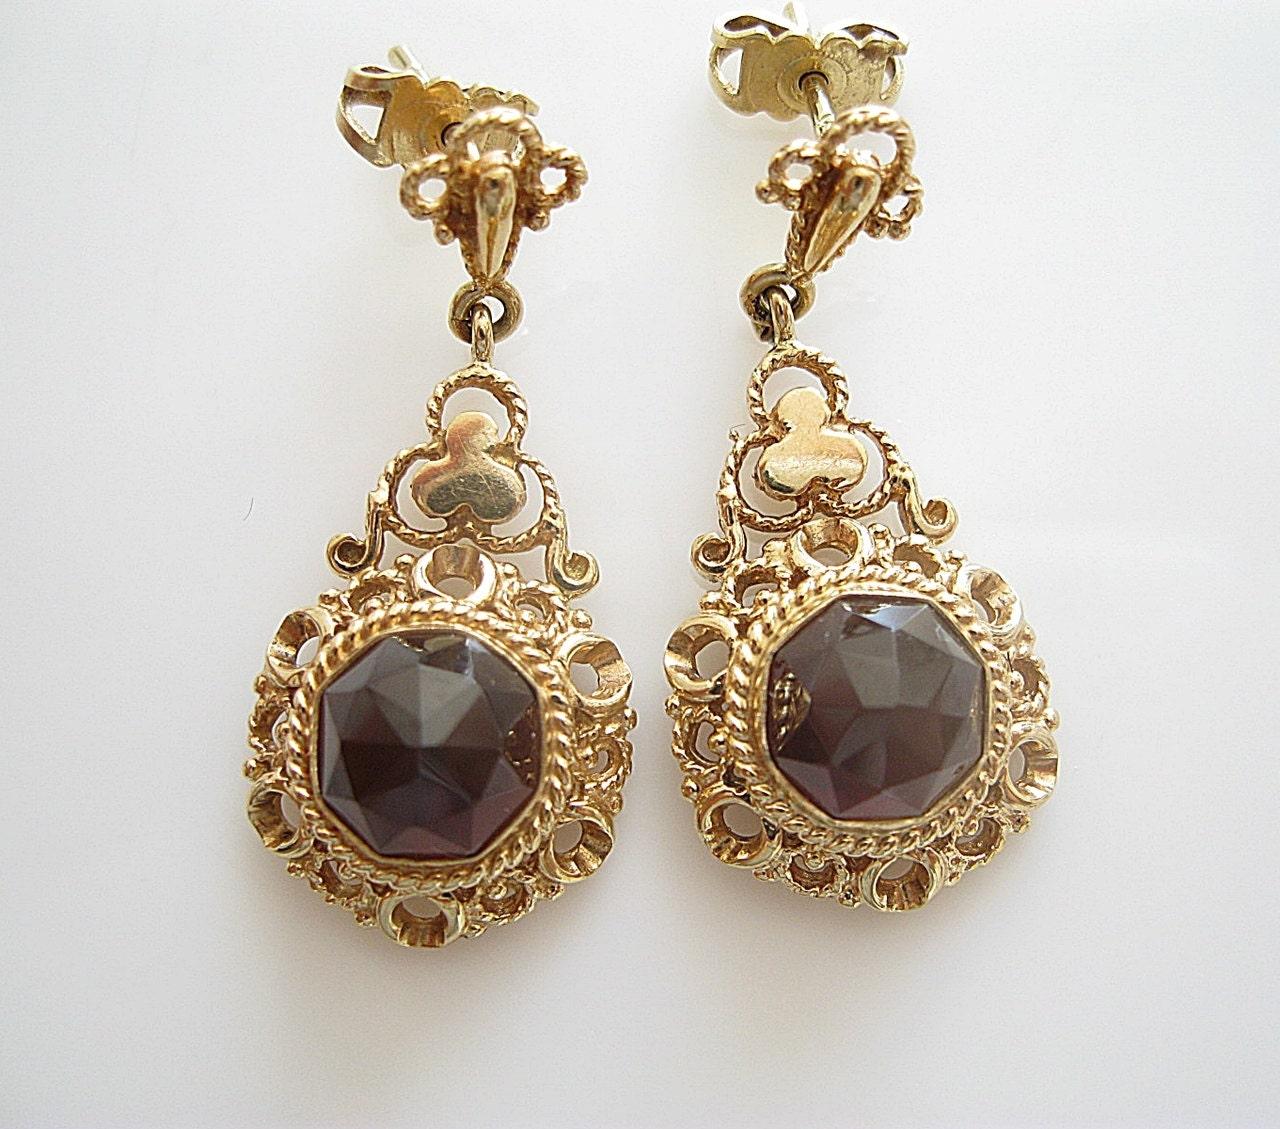 Antique gold rings : Antique garnet karat gold earrings jewelry